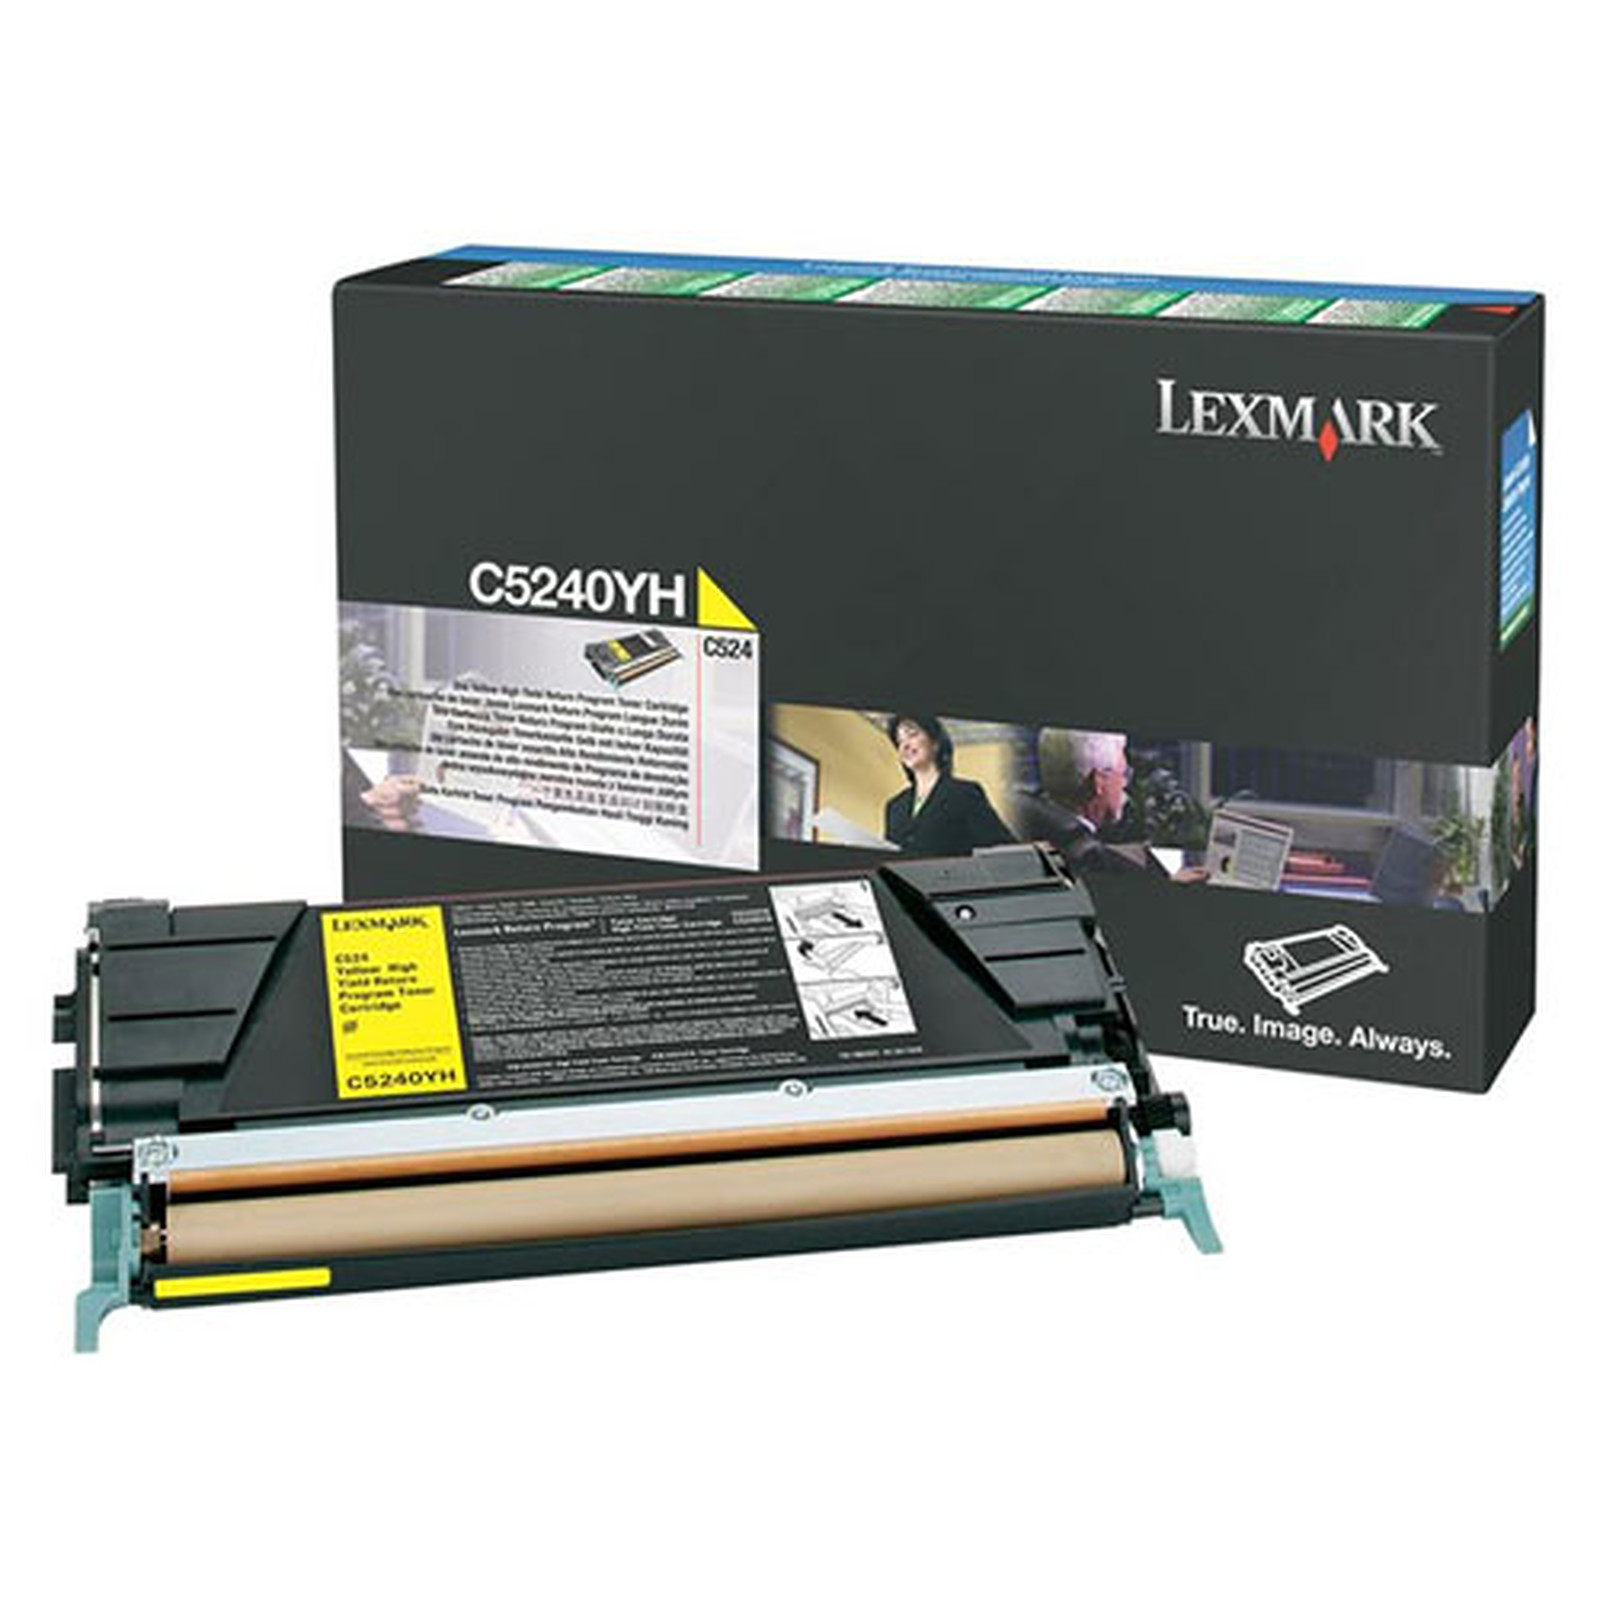 Lexmark 00C5240YH